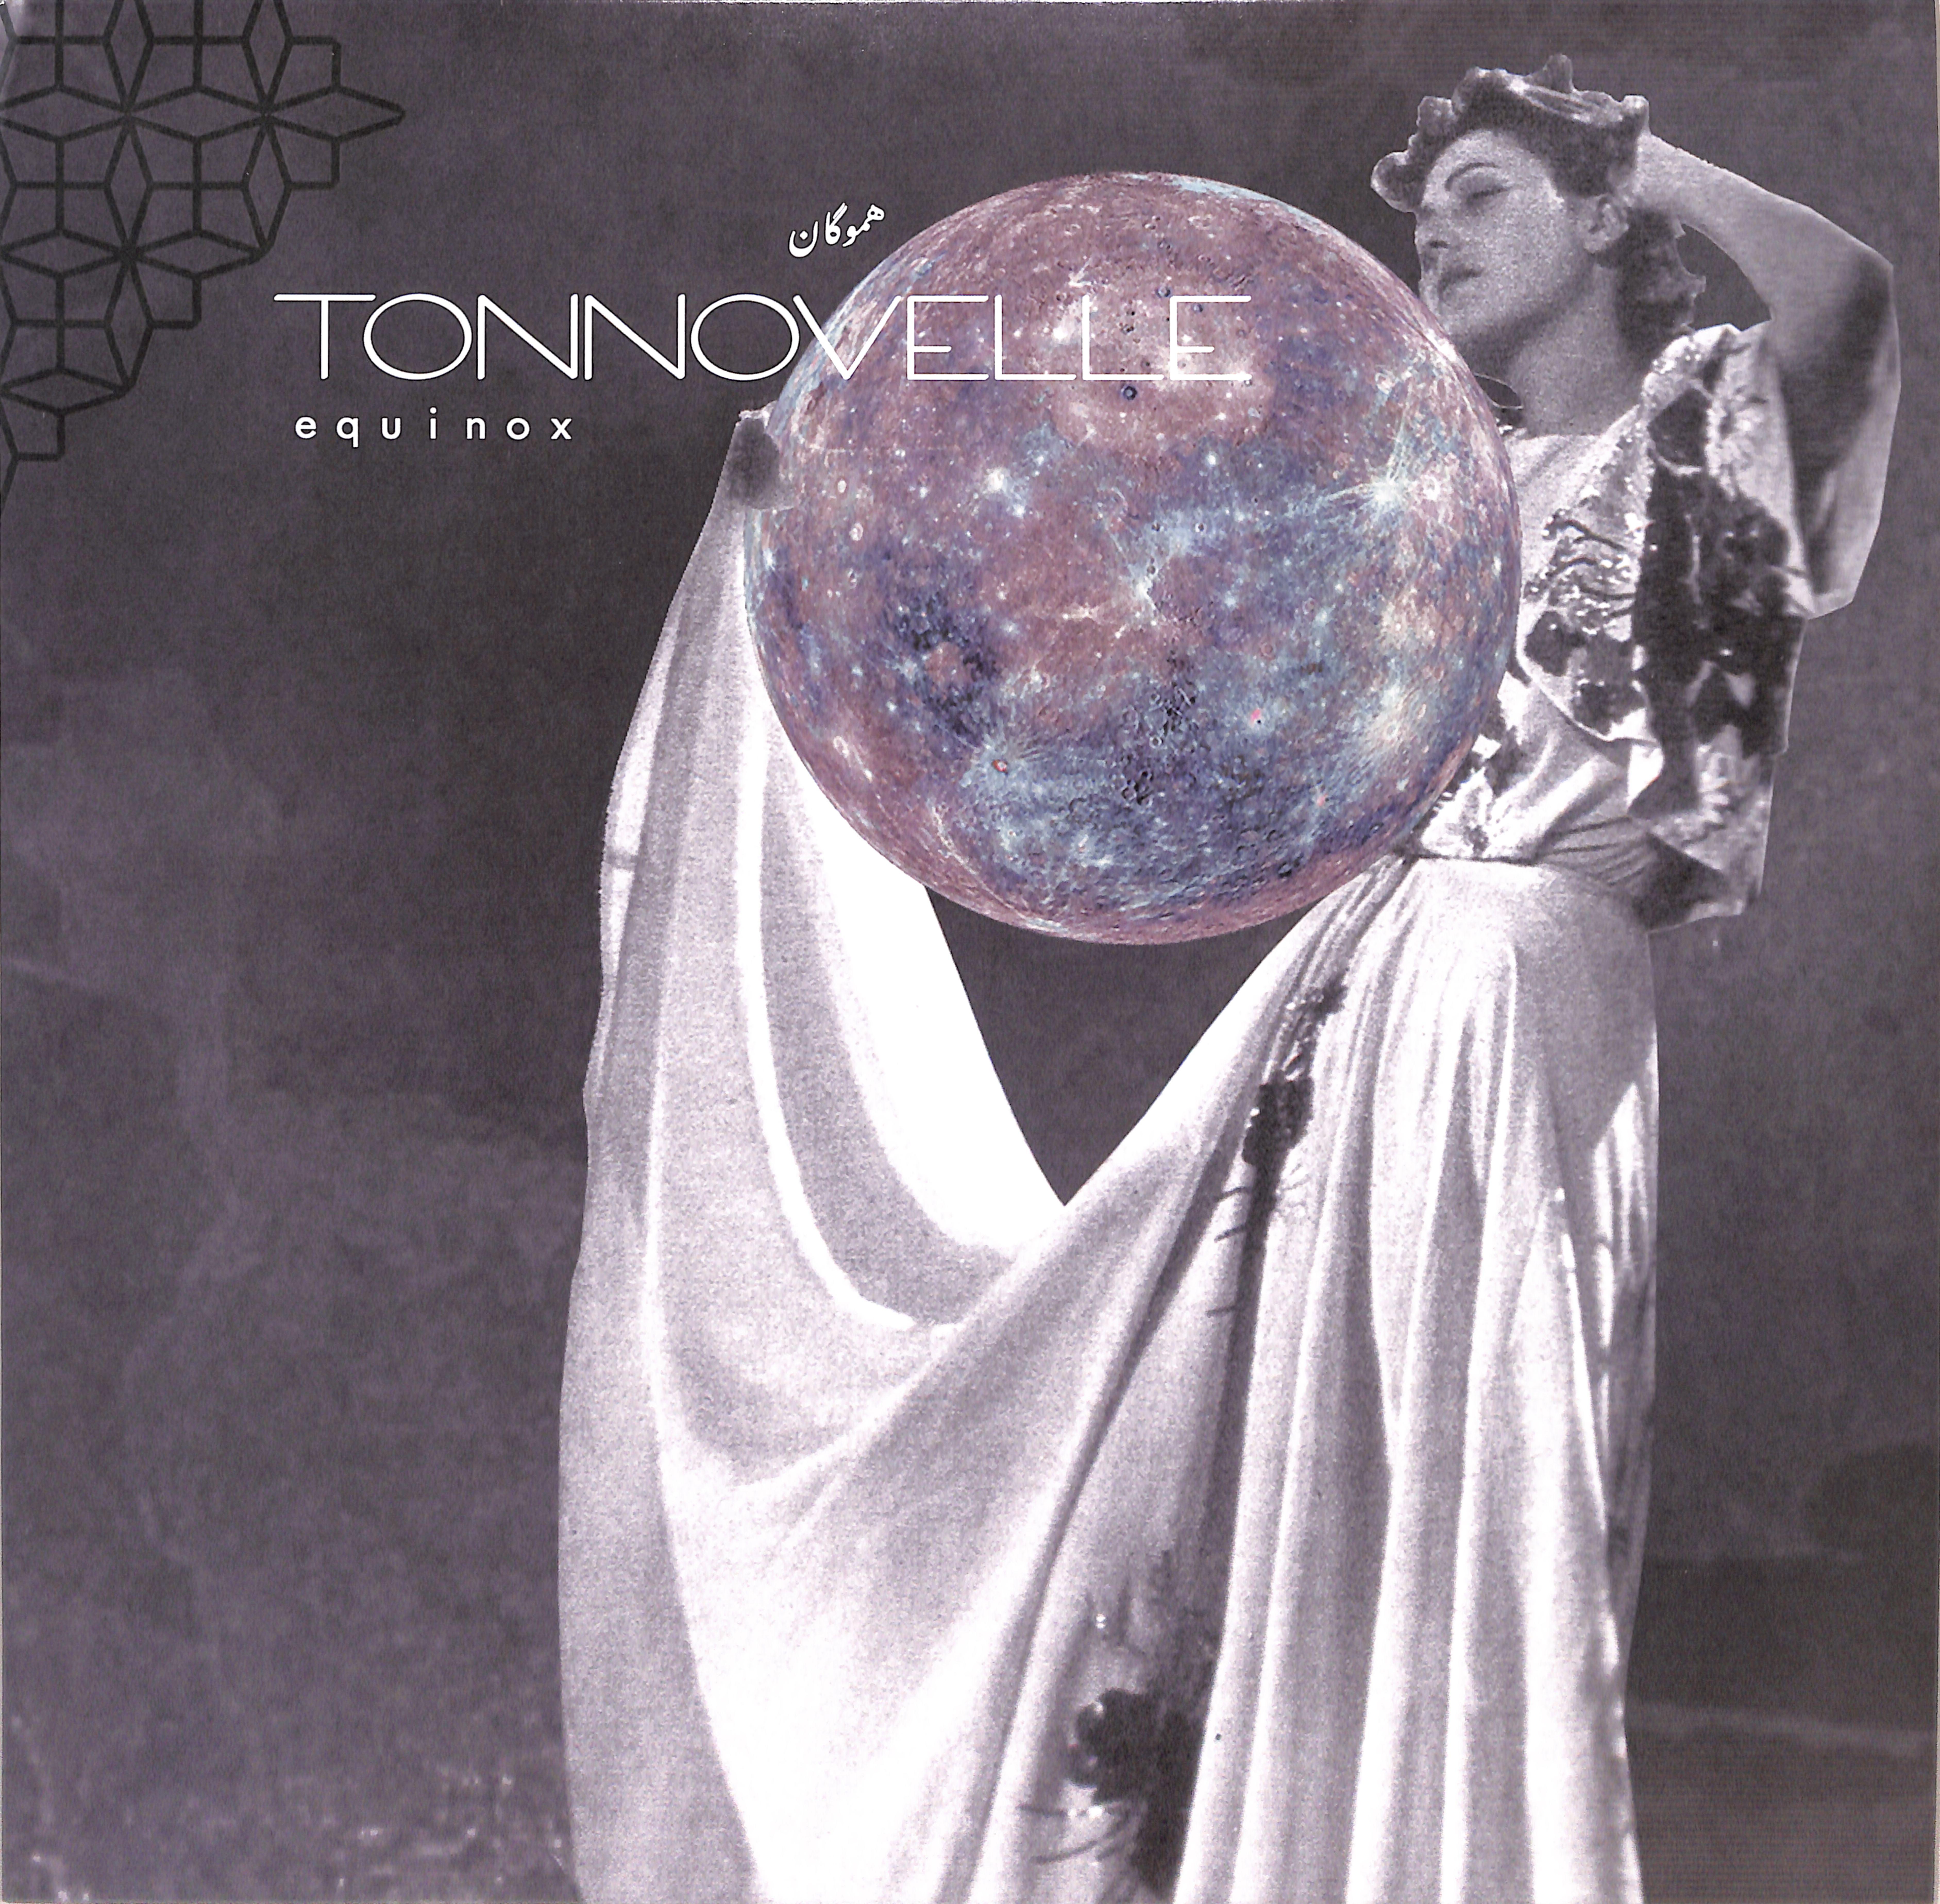 Tonnovelle - EQUINOX EP